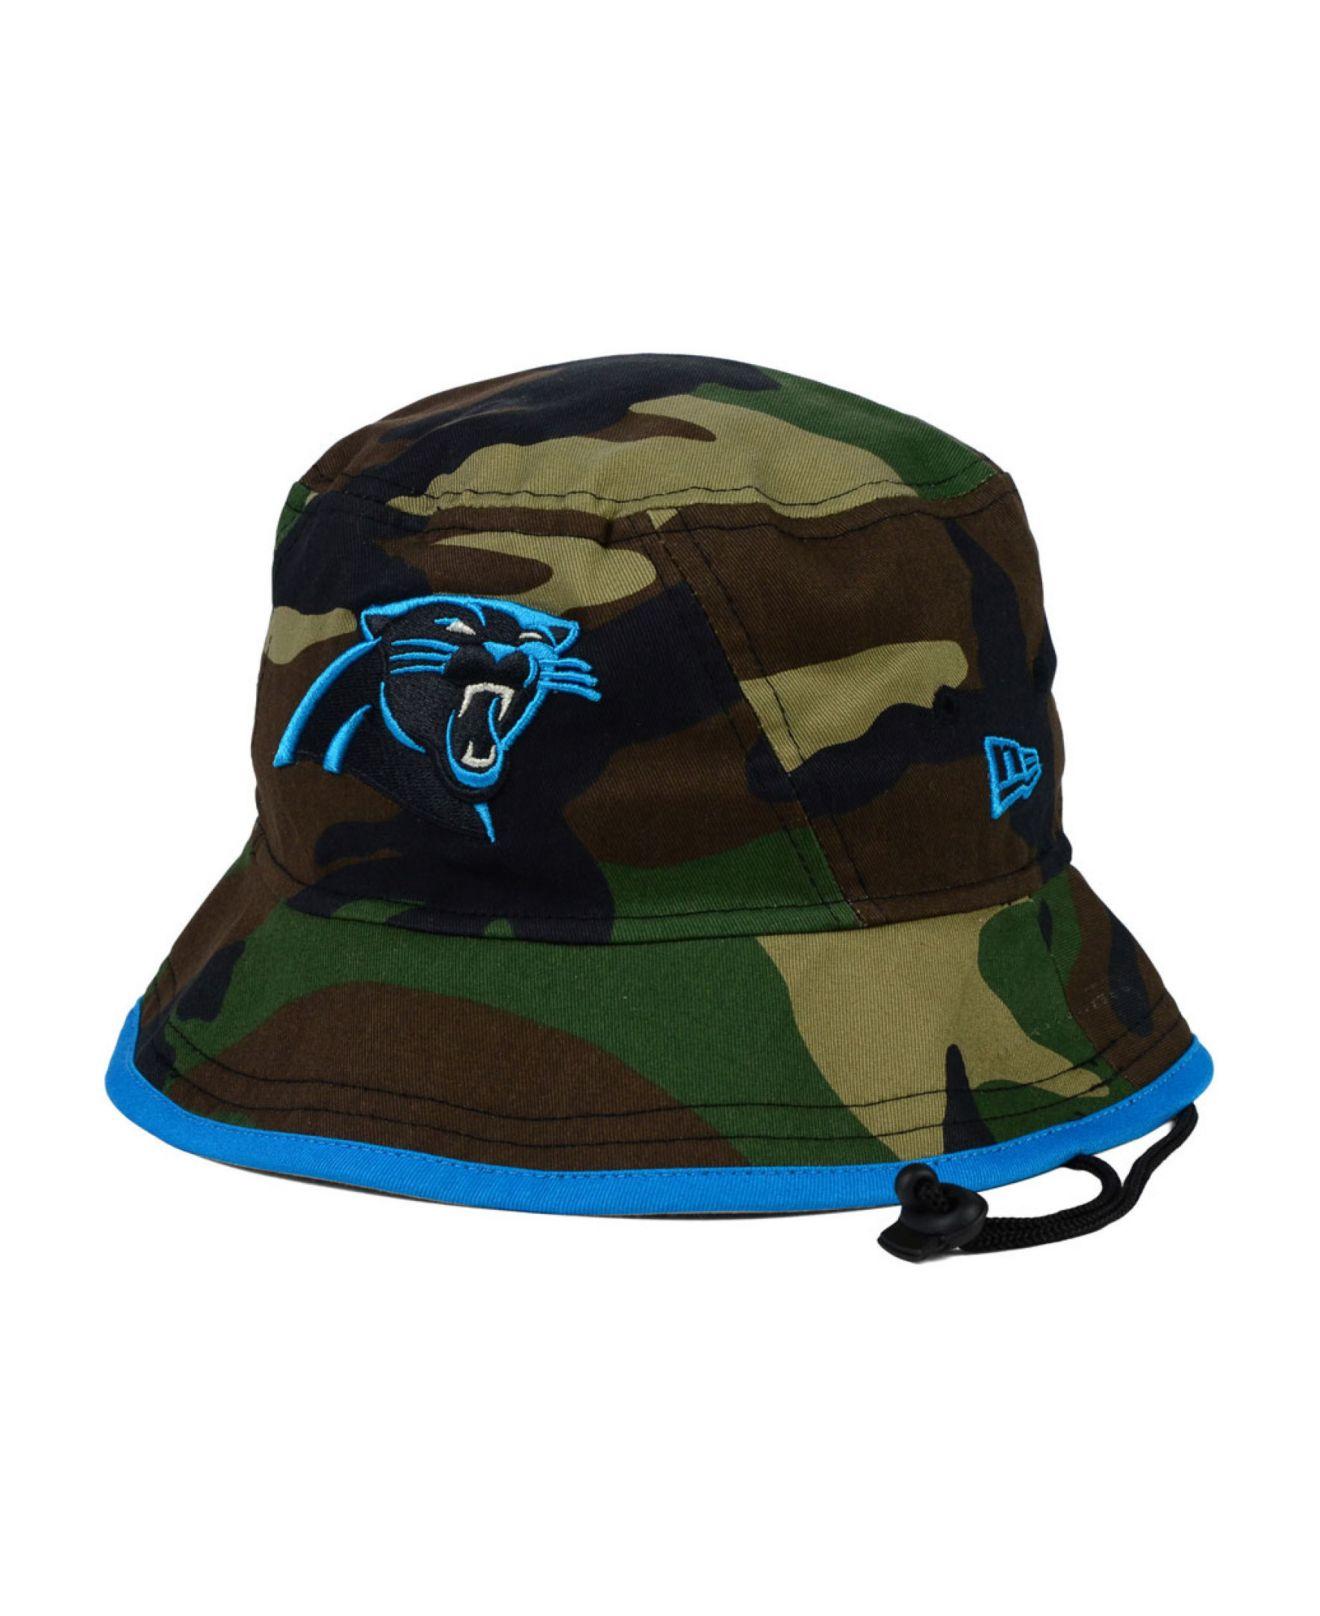 Lyst - KTZ Carolina Panthers Camo Pop Bucket Hat in Green for Men da0038f00